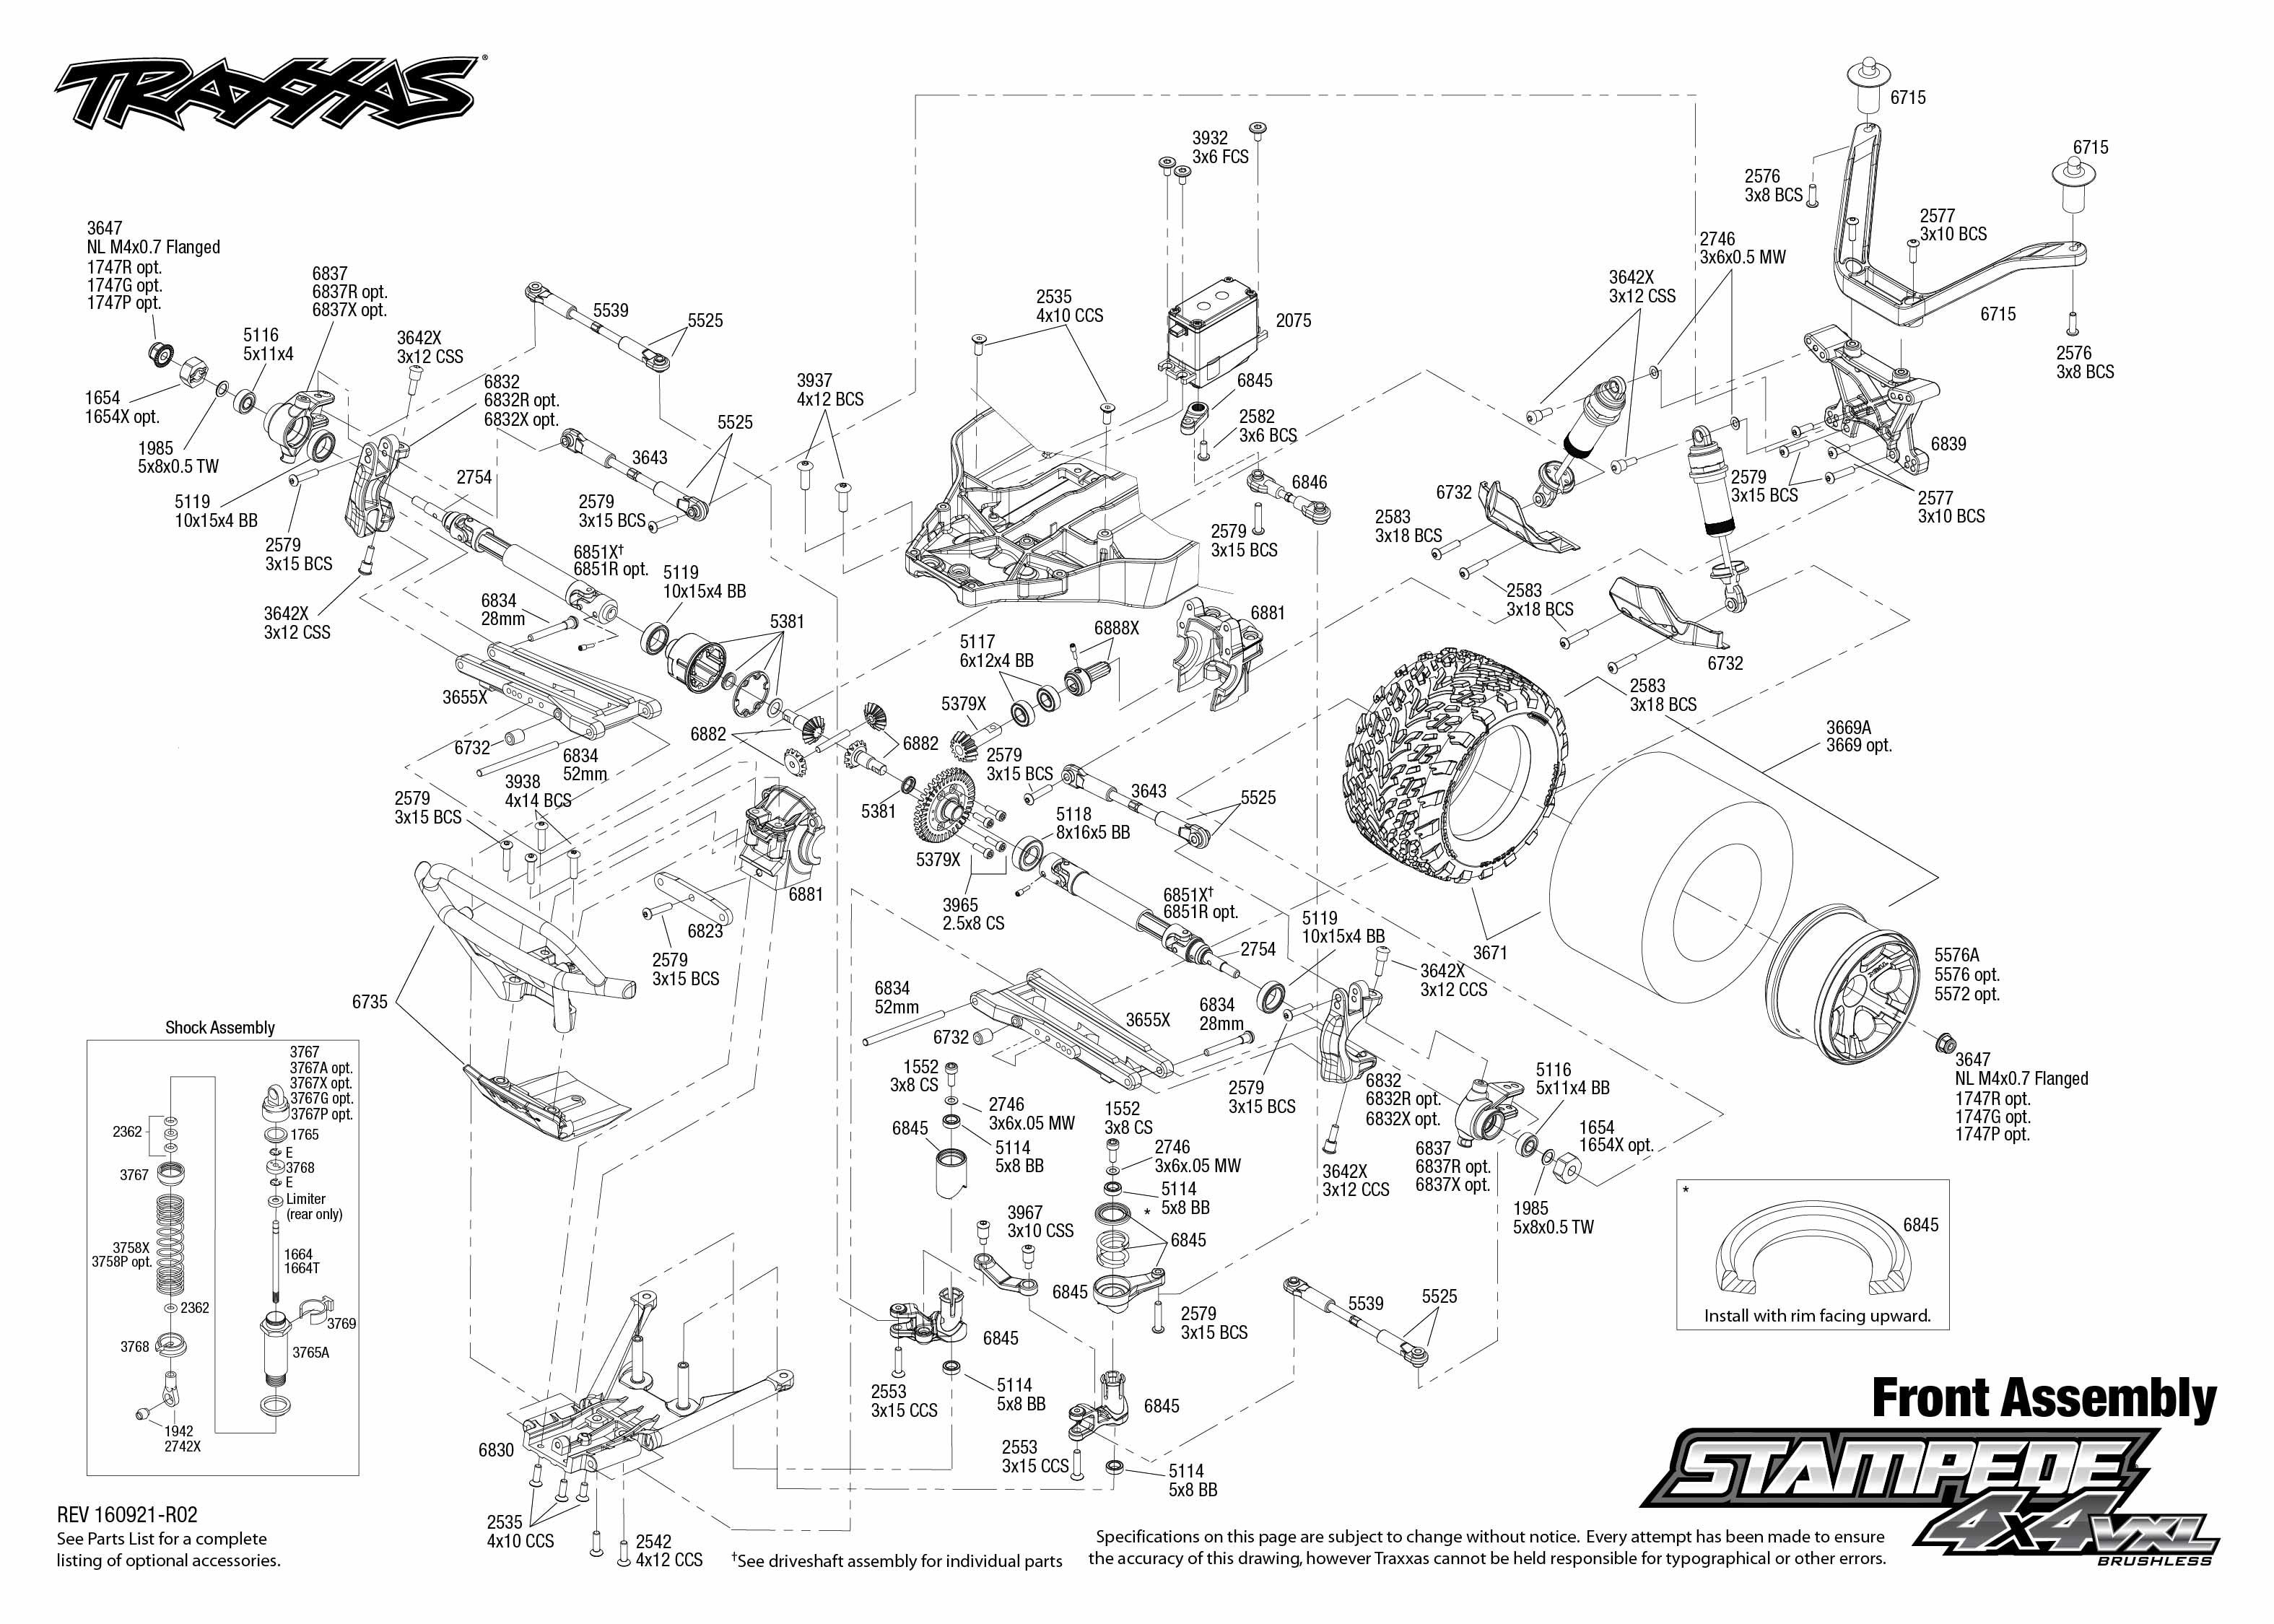 Mobile Auto Engine Parts Diagram - wiring diagrams